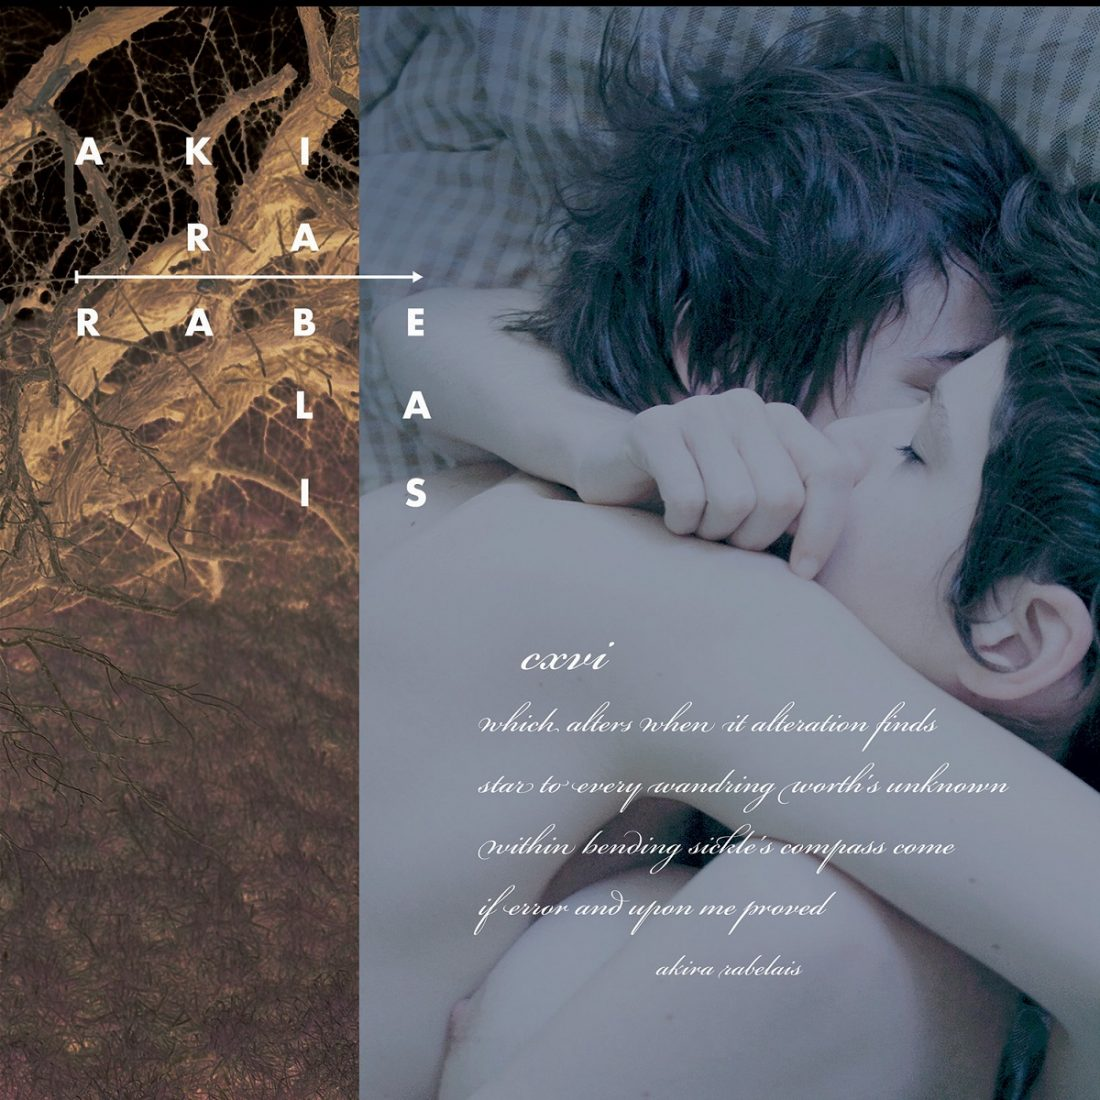 Akira Rabelais - CXVI – Ambientblog